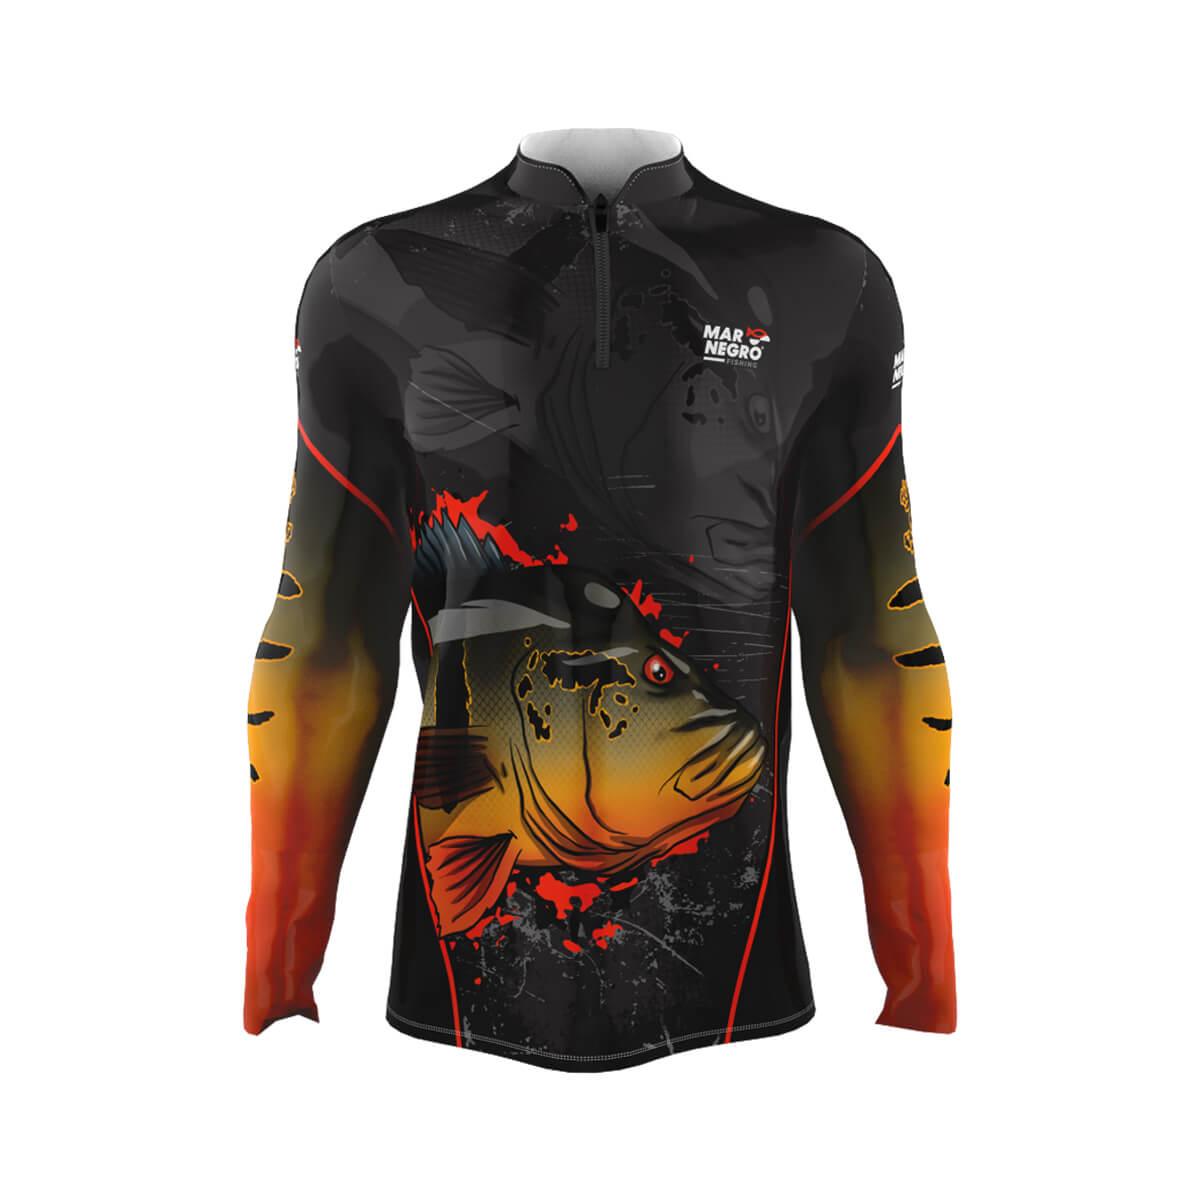 Camiseta Mar Negro 2021 Infantil Tucunaré Açu  - Pró Pesca Shop